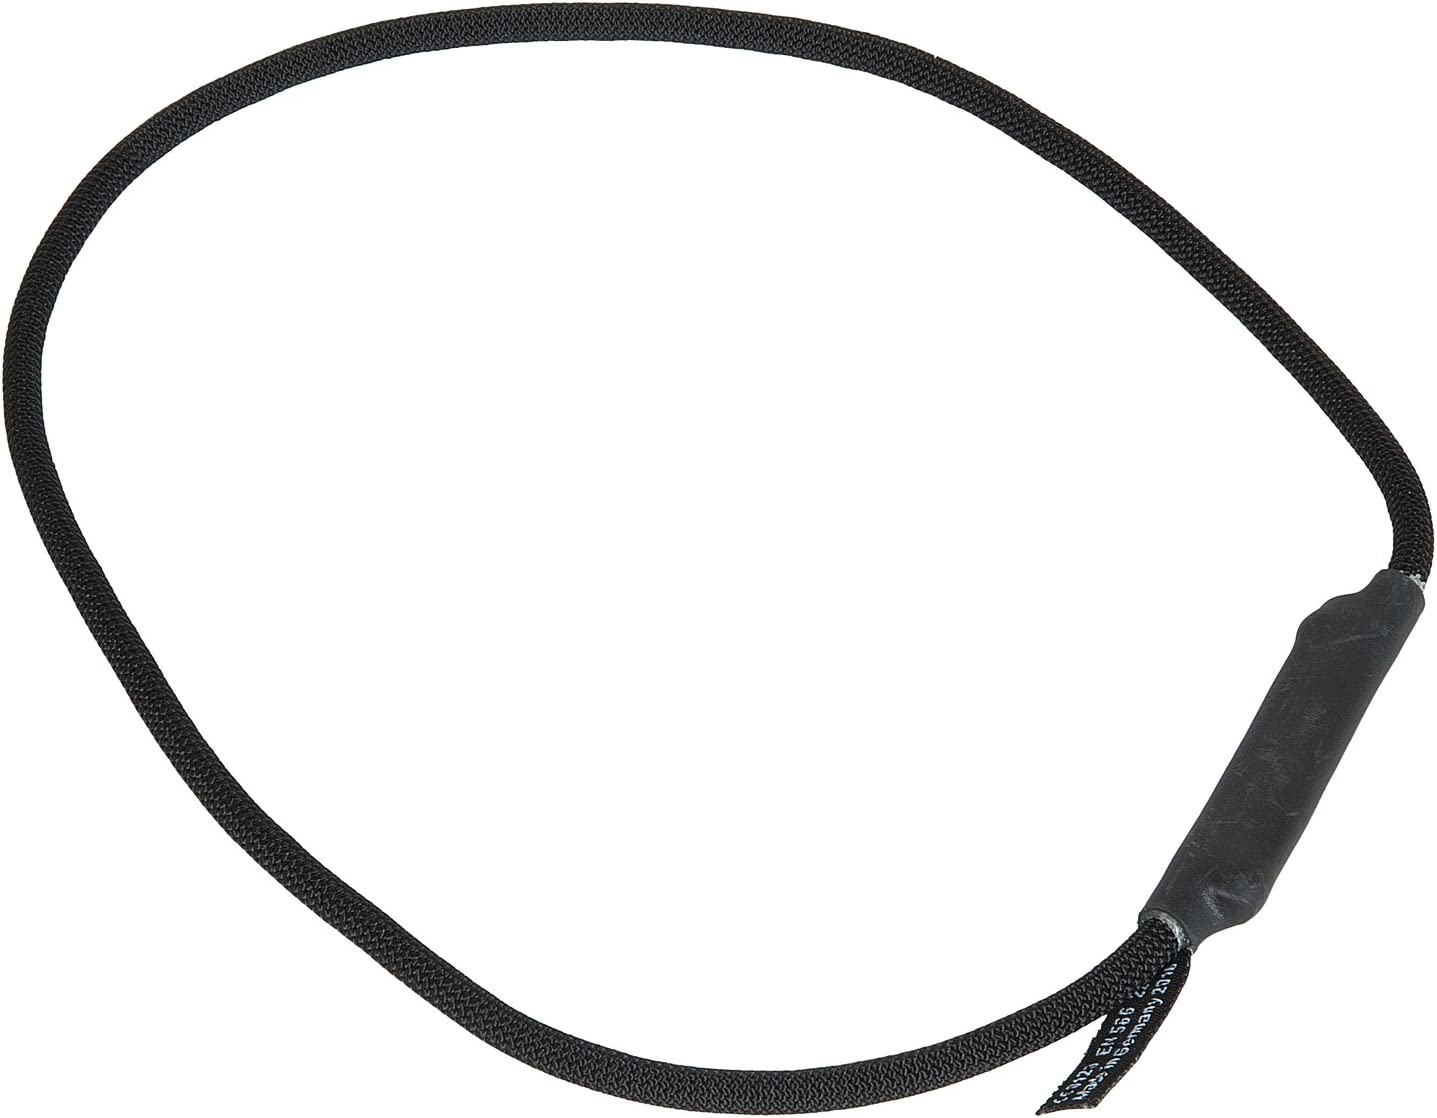 EDELRID Schlinge Aramid Cord Sling VPE10-Cuerda (6 mm), Unisex Adulto